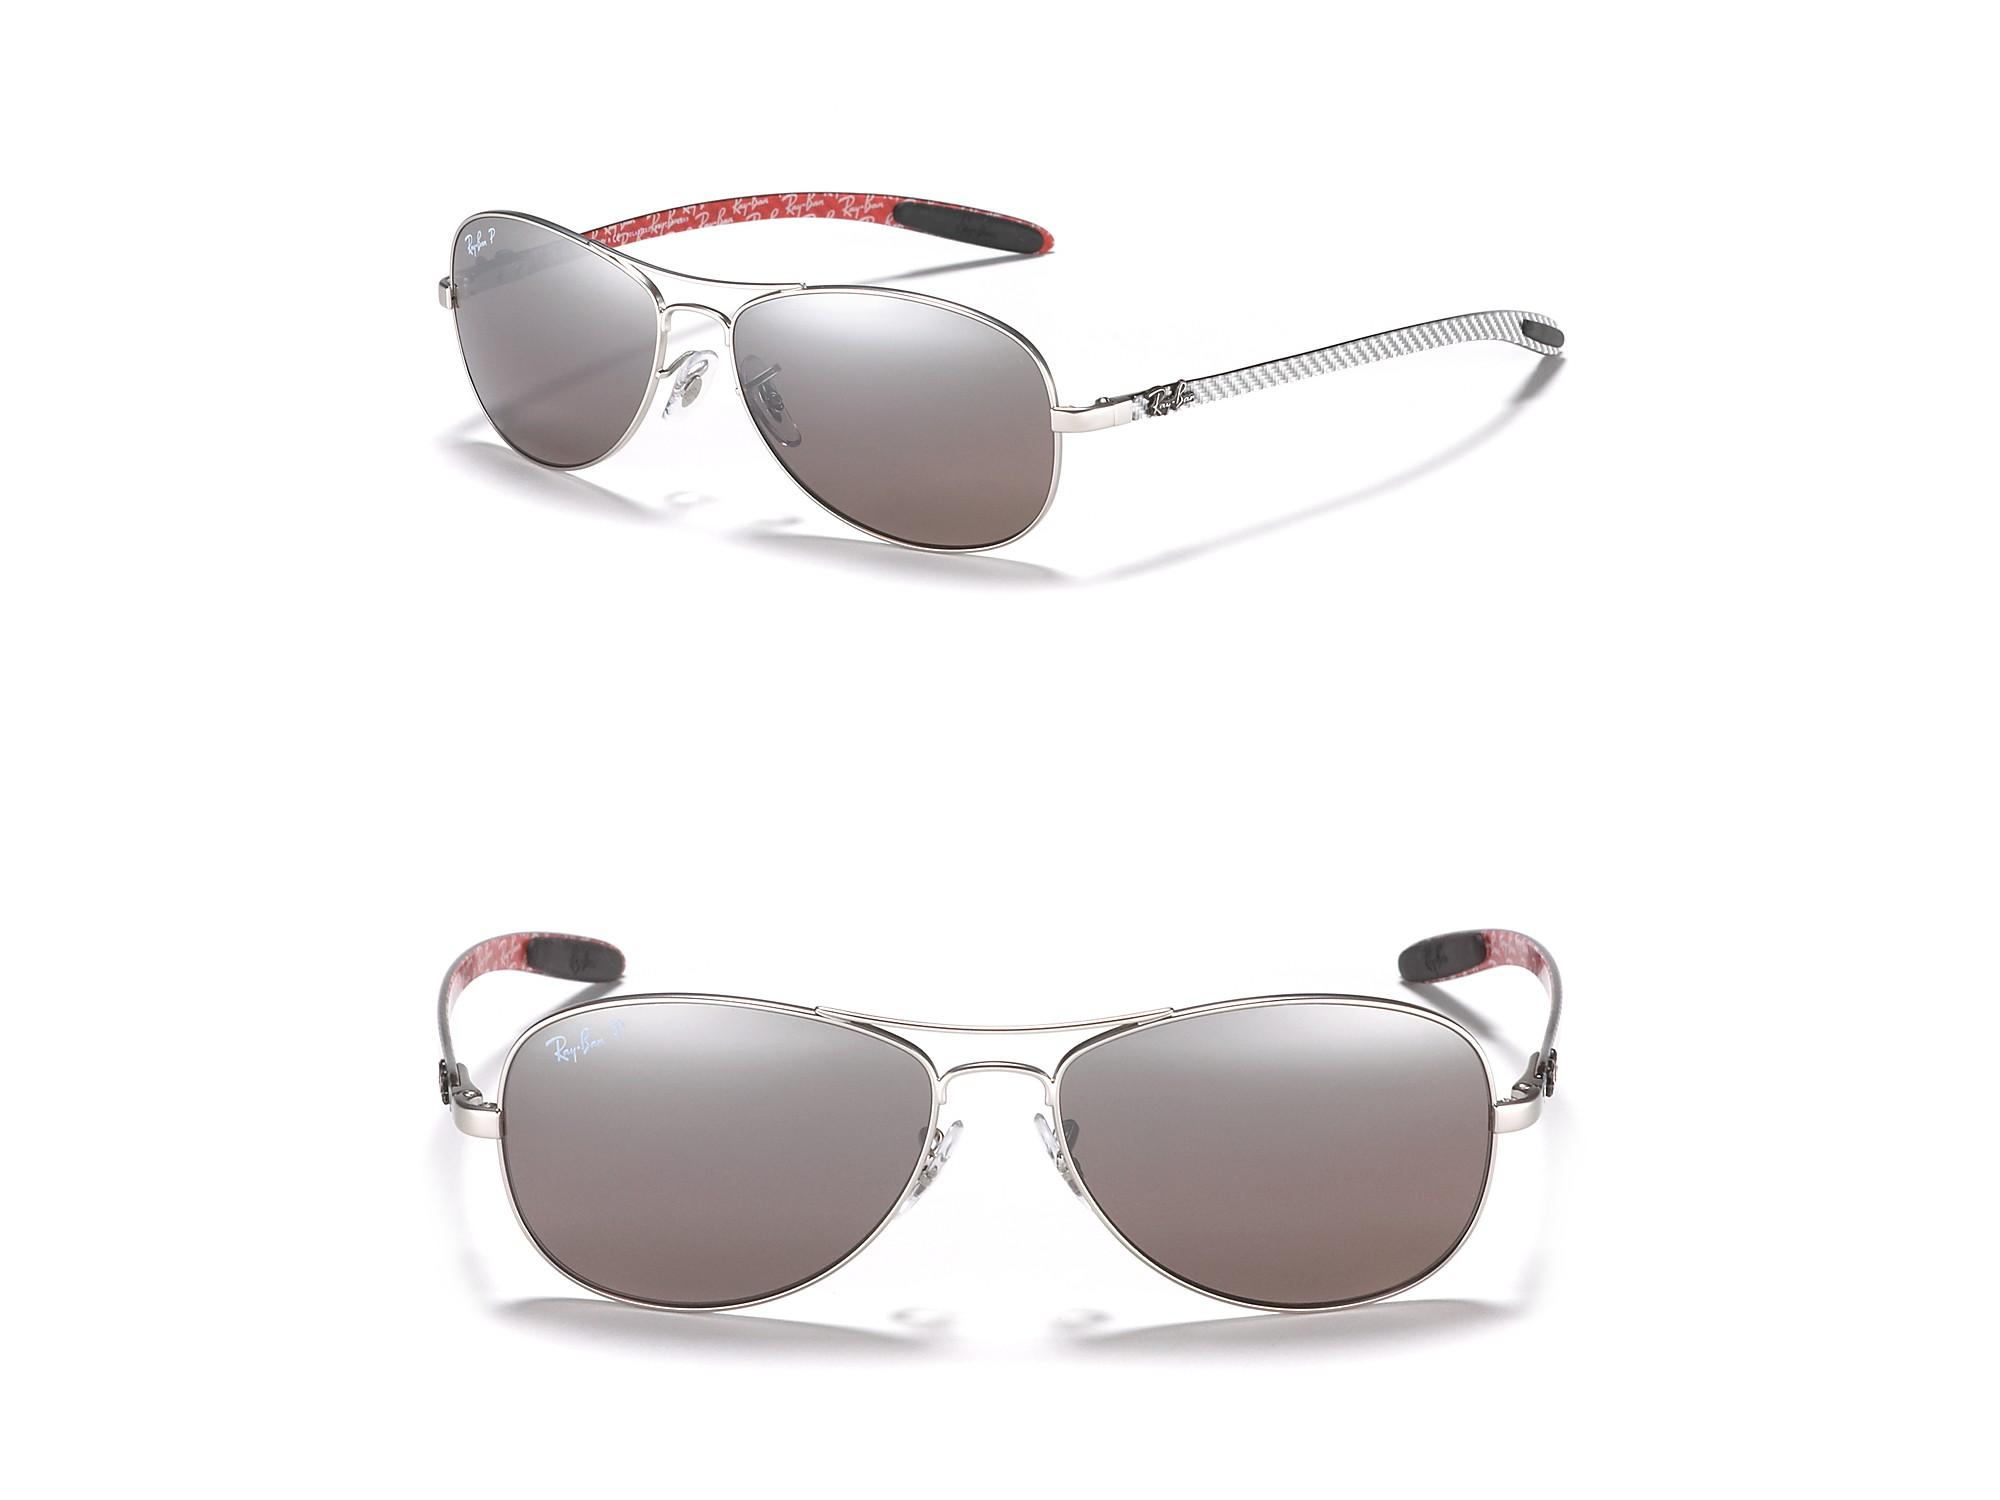 Ray-Ban Tech Aviator Polarized Sunglasses in Metallic for